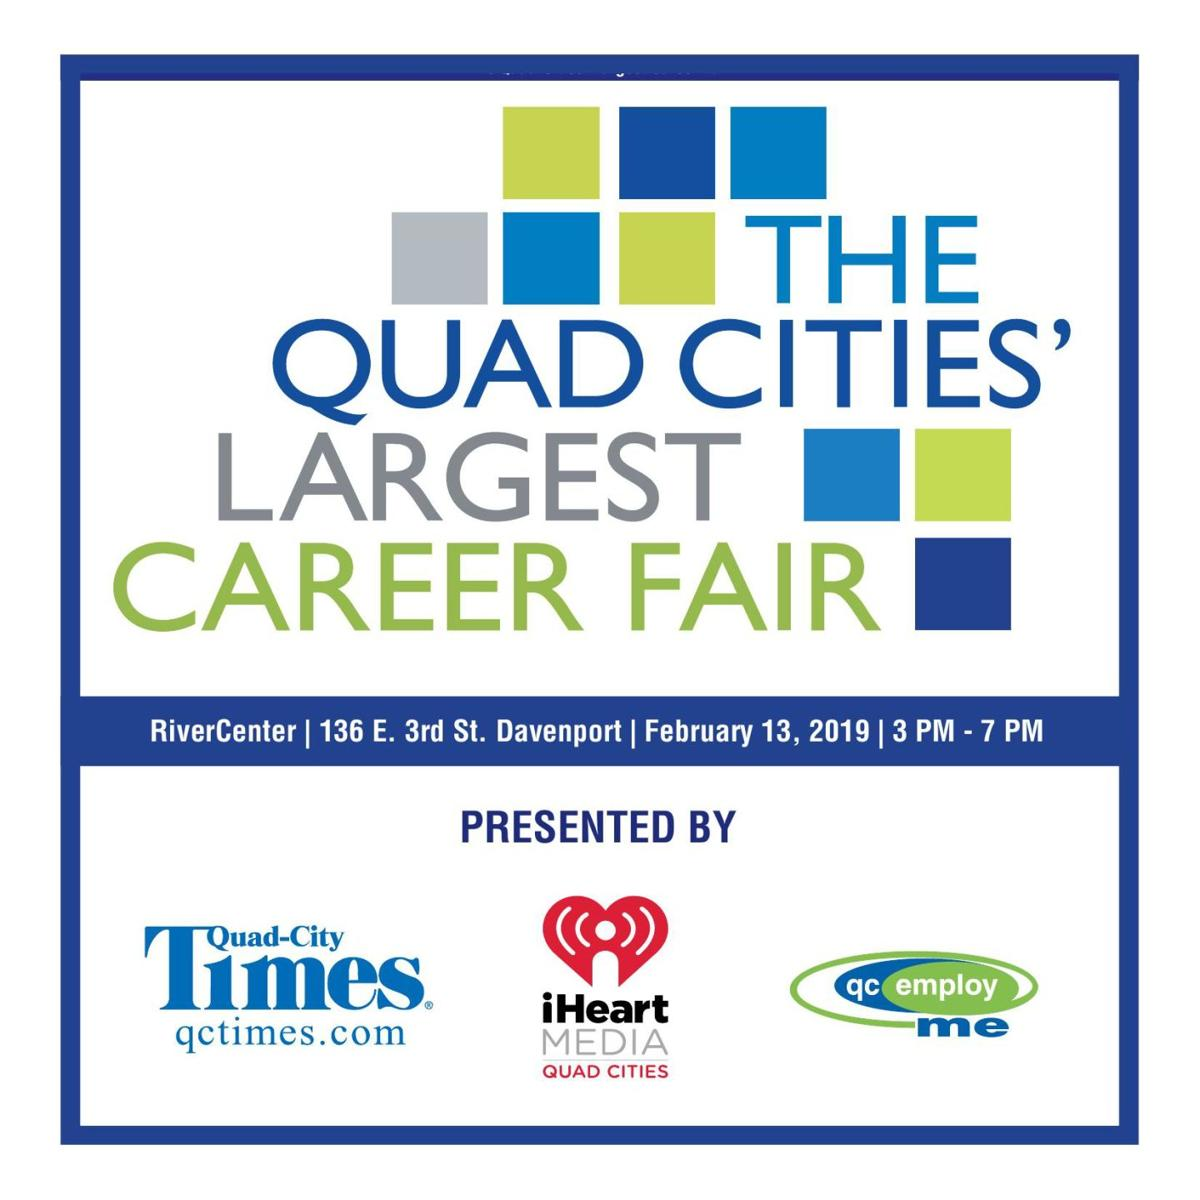 The Quad-Cities' Largest Career Fair